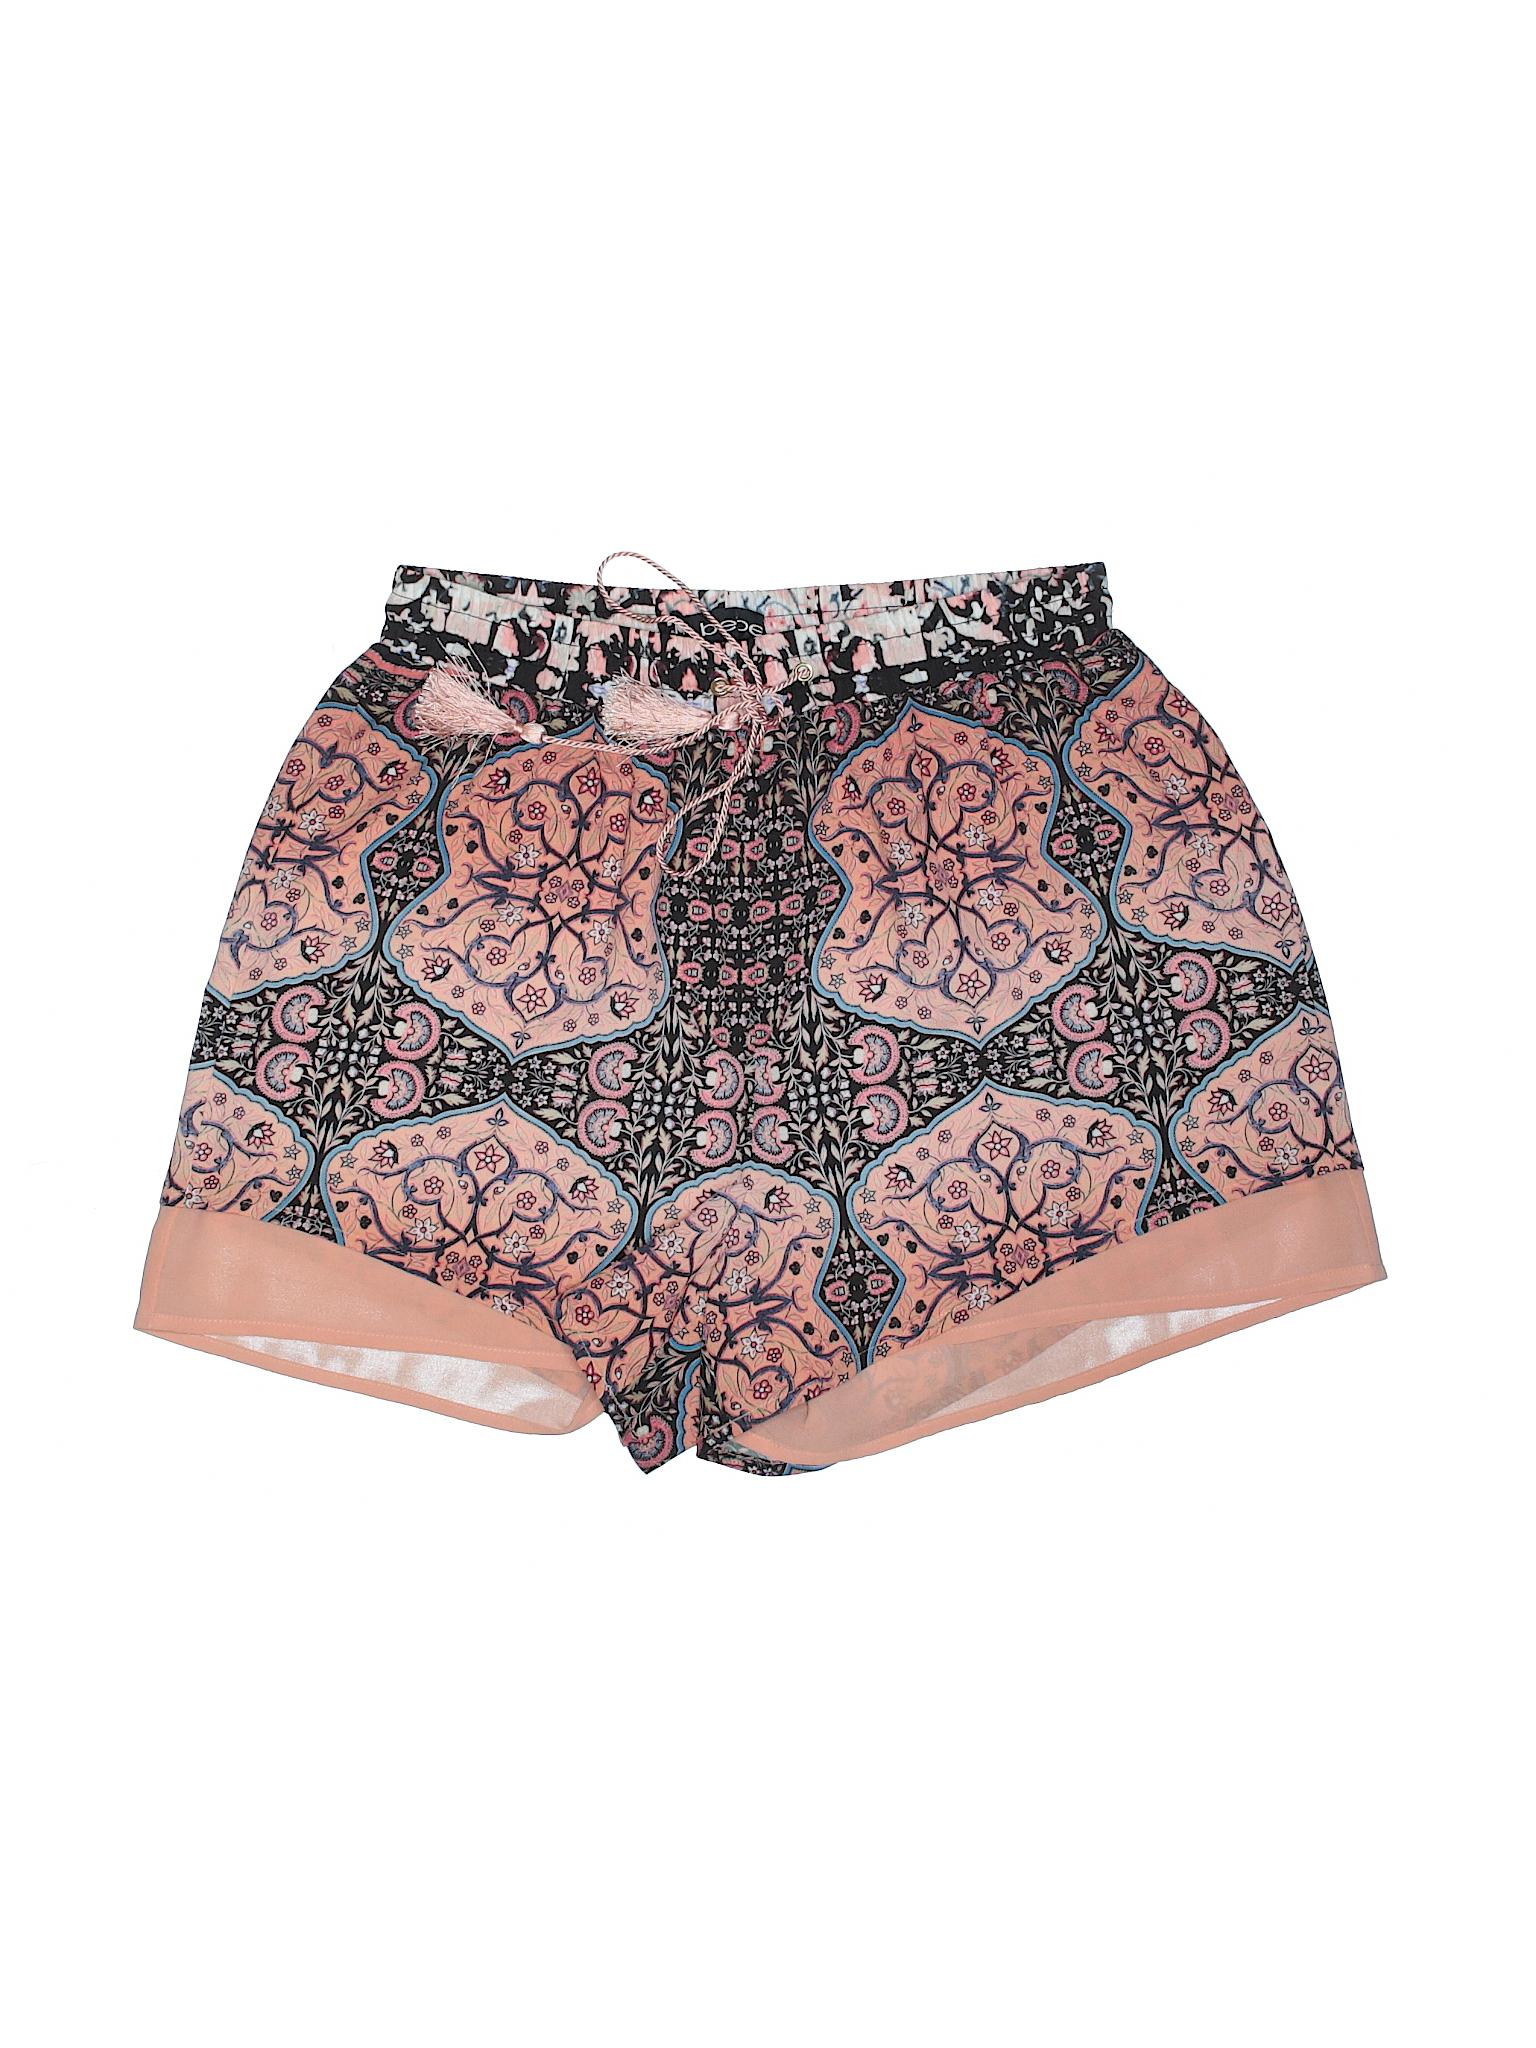 Boutique Shorts Shorts Bebe Bebe Bebe Boutique Shorts Boutique Boutique Tq1arTx